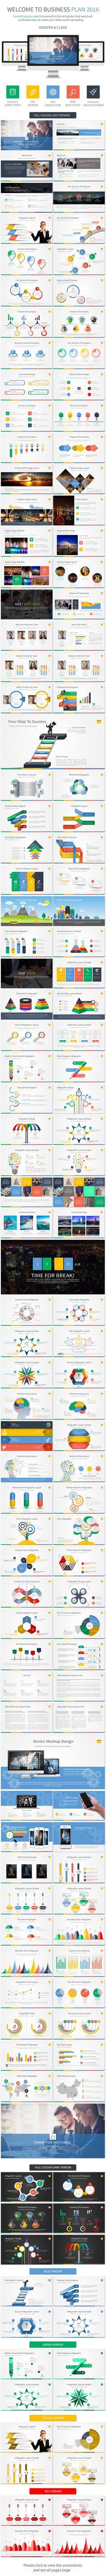 Business Plan 2016 Keynote Template — Keynote KEY #portfolio #template • Available here → https://graphicriver.net/item/business-plan-2016-keynote-template/15675357?ref=pxcr